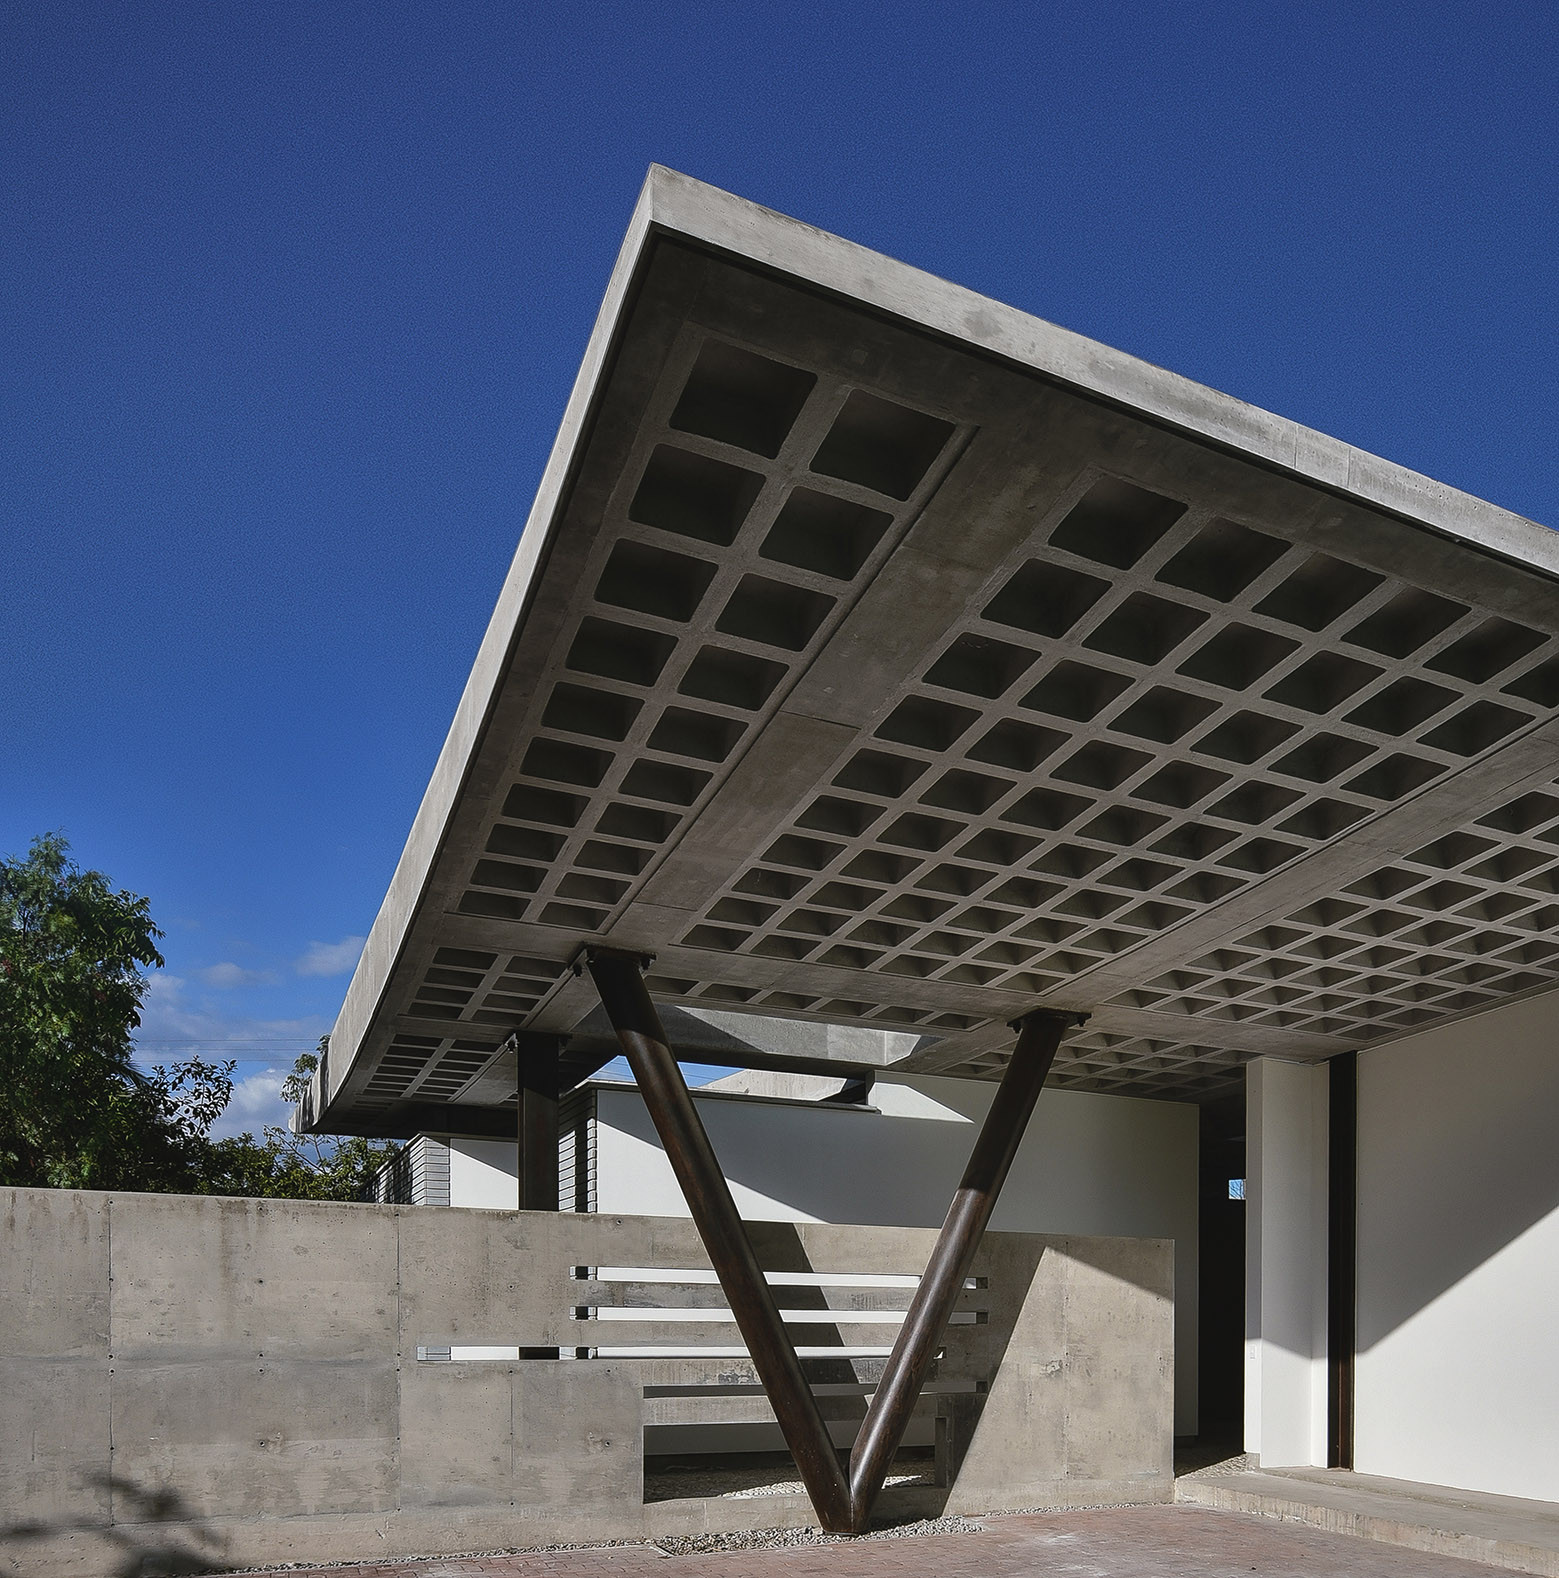 odD House 1.0 / odD+, © Jose Ignacio Correa & Jean-Claude Constant L